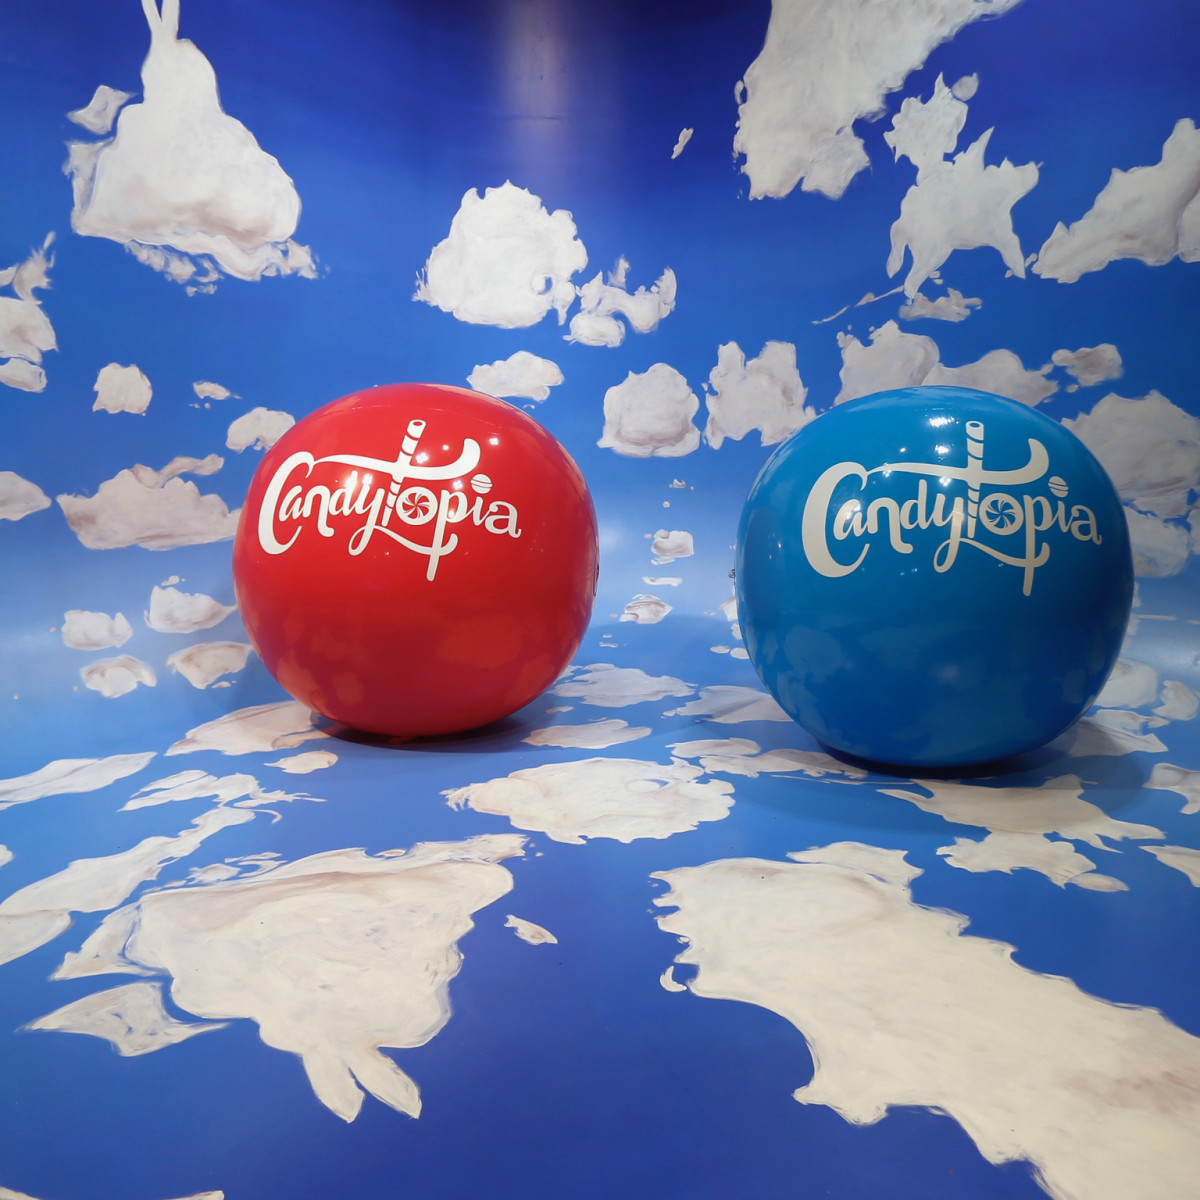 Candytopia Houston bouncy balls